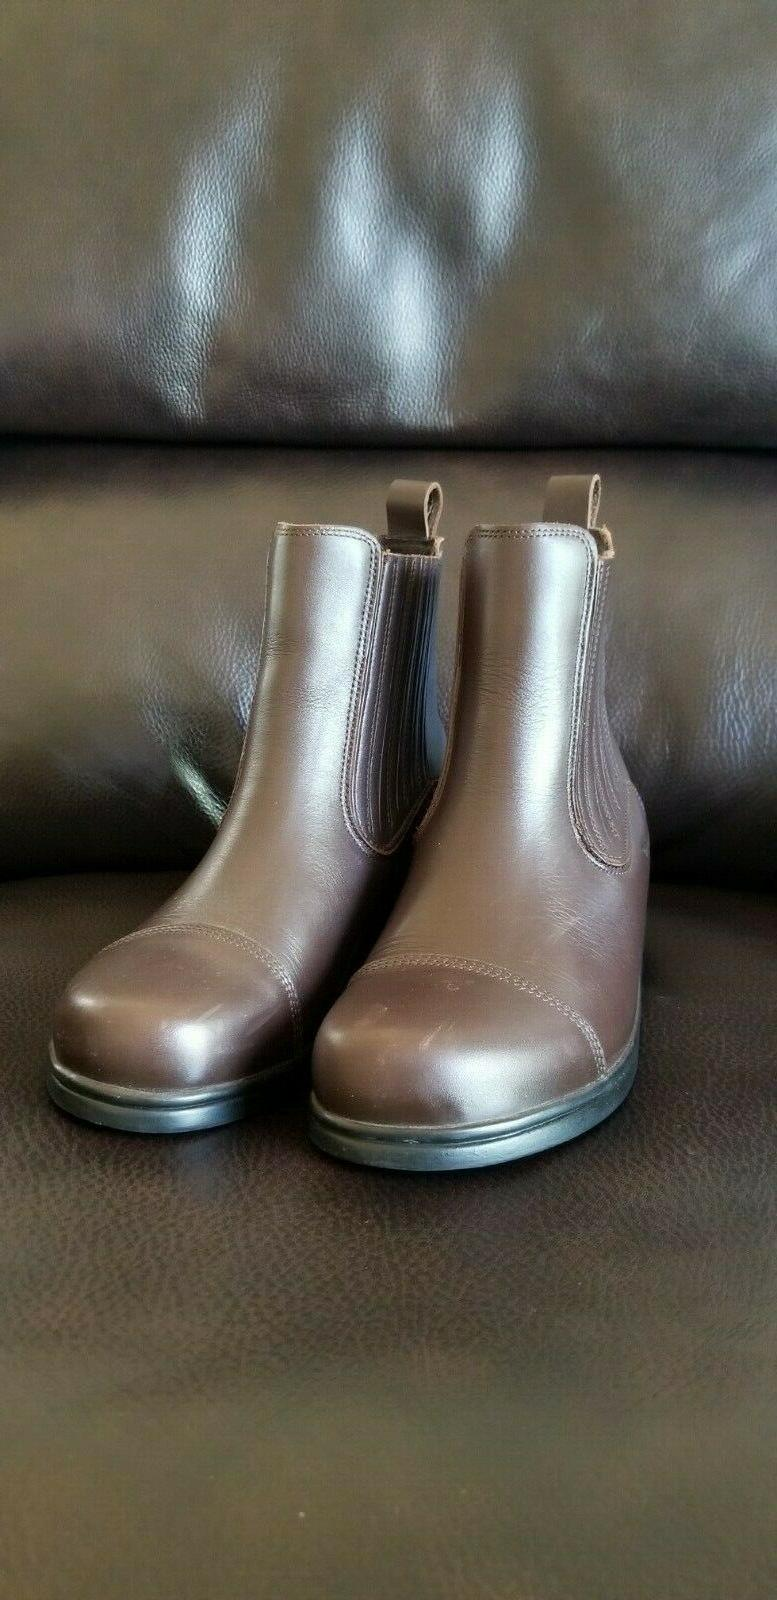 Dansko Womens Size 8 Leather Pull-On